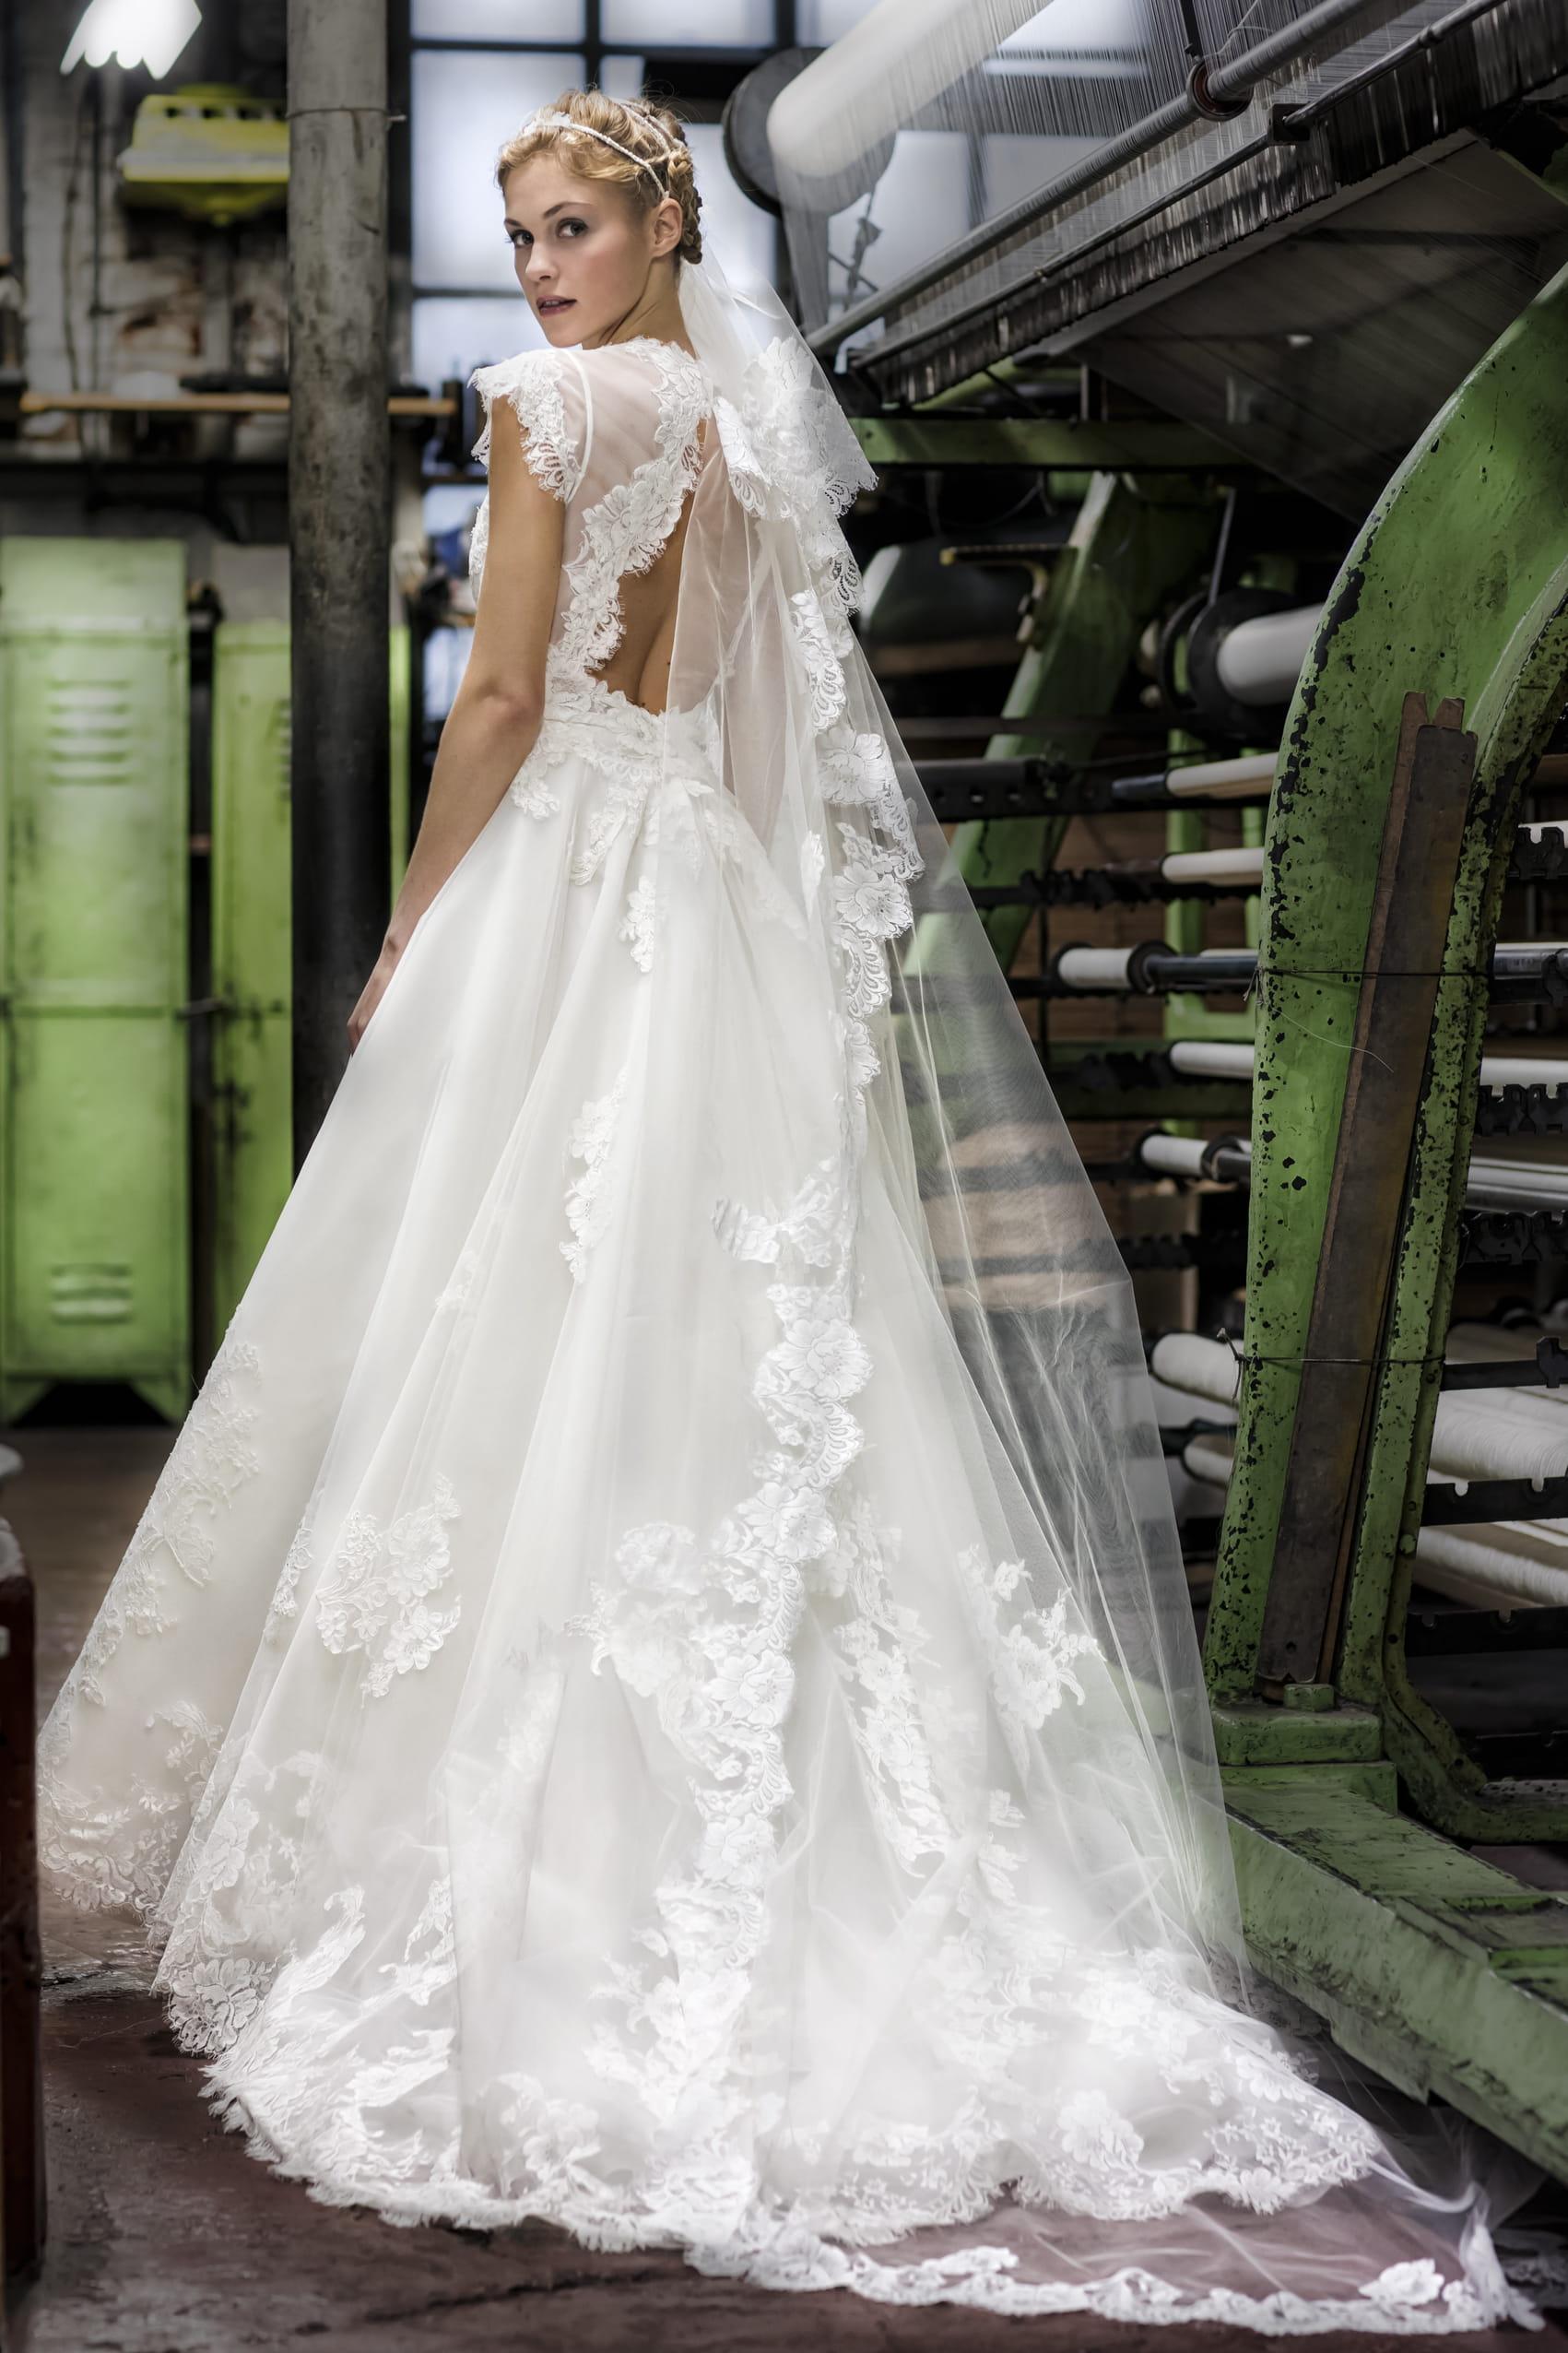 Robe de mari e begonia cymbeline for Prix de robe de mariage en or georges chakra